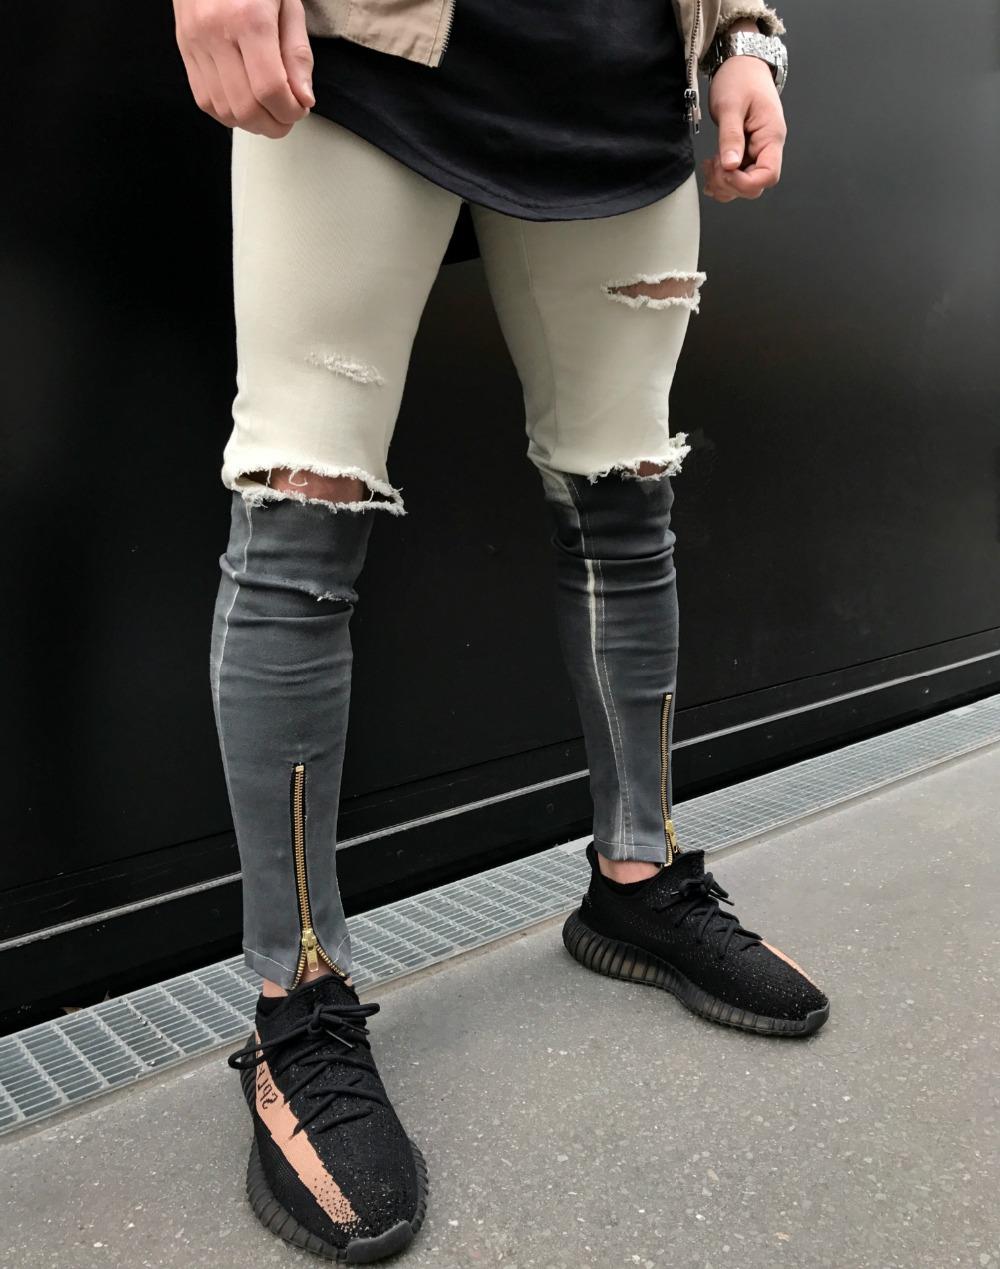 new selection hot-seeling original real quality 2017 Men Knee Zipper Destroyed Jeans Skinny Stretch Fashion Ripped Designer  Pencil Khaki black White Khaki biker Jeans Joggers